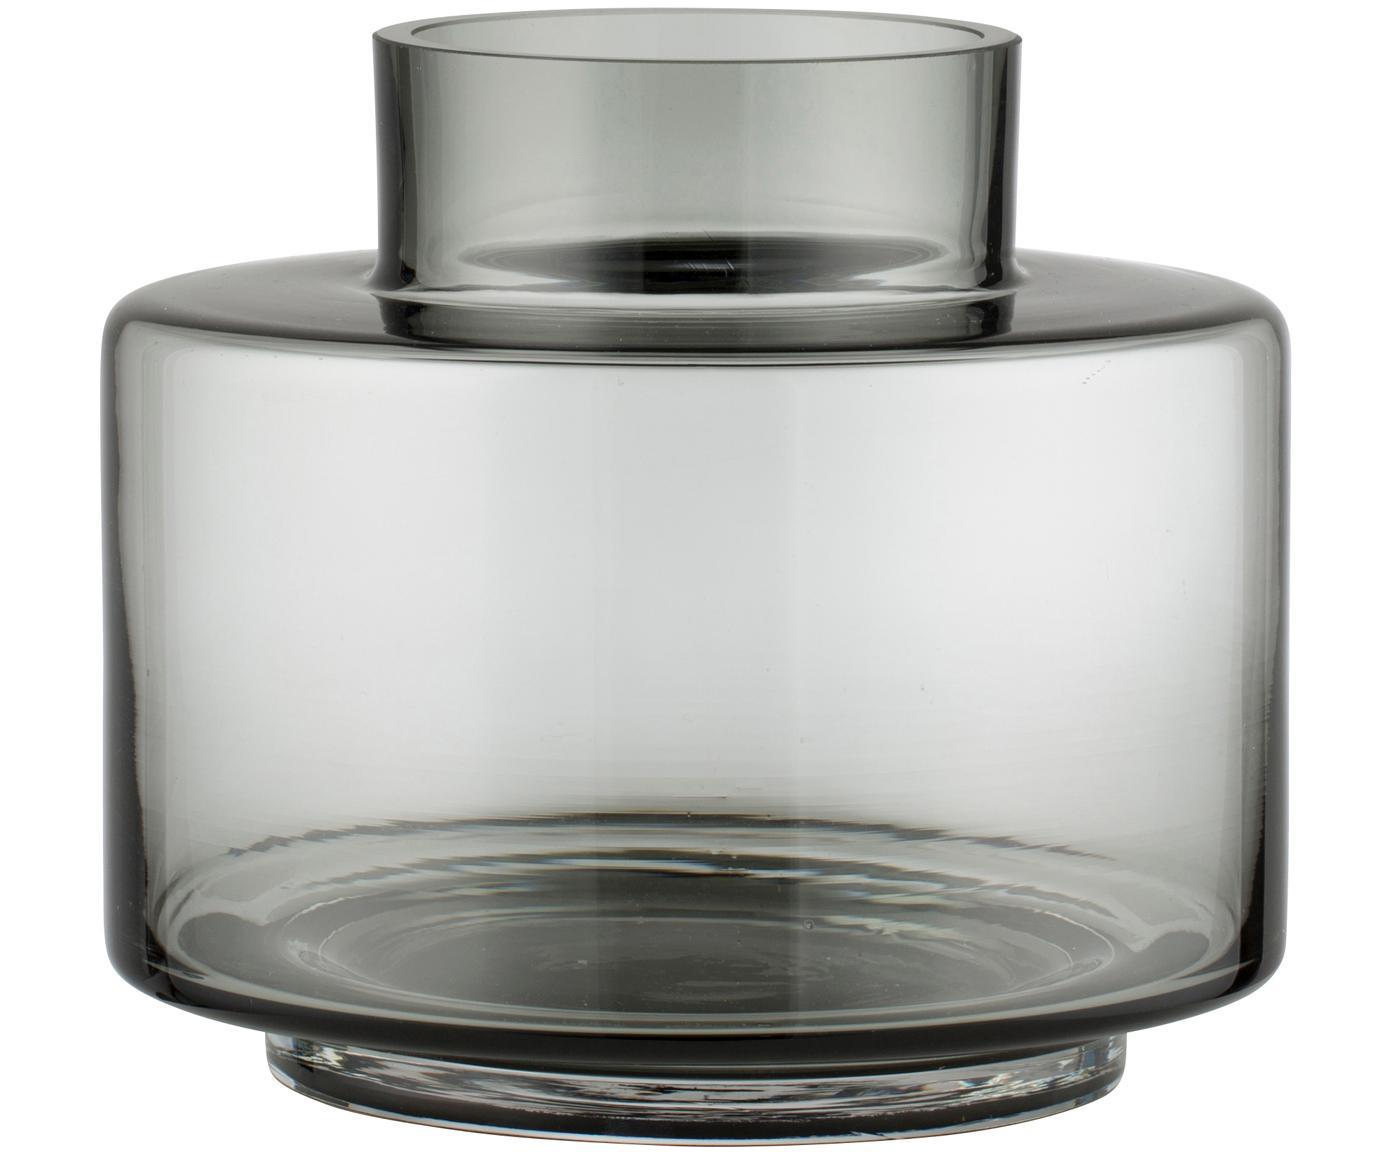 Mundgeblasene Vase Hedria, klein, Glas, Rauchgrau, Ø 18 x H 16 cm